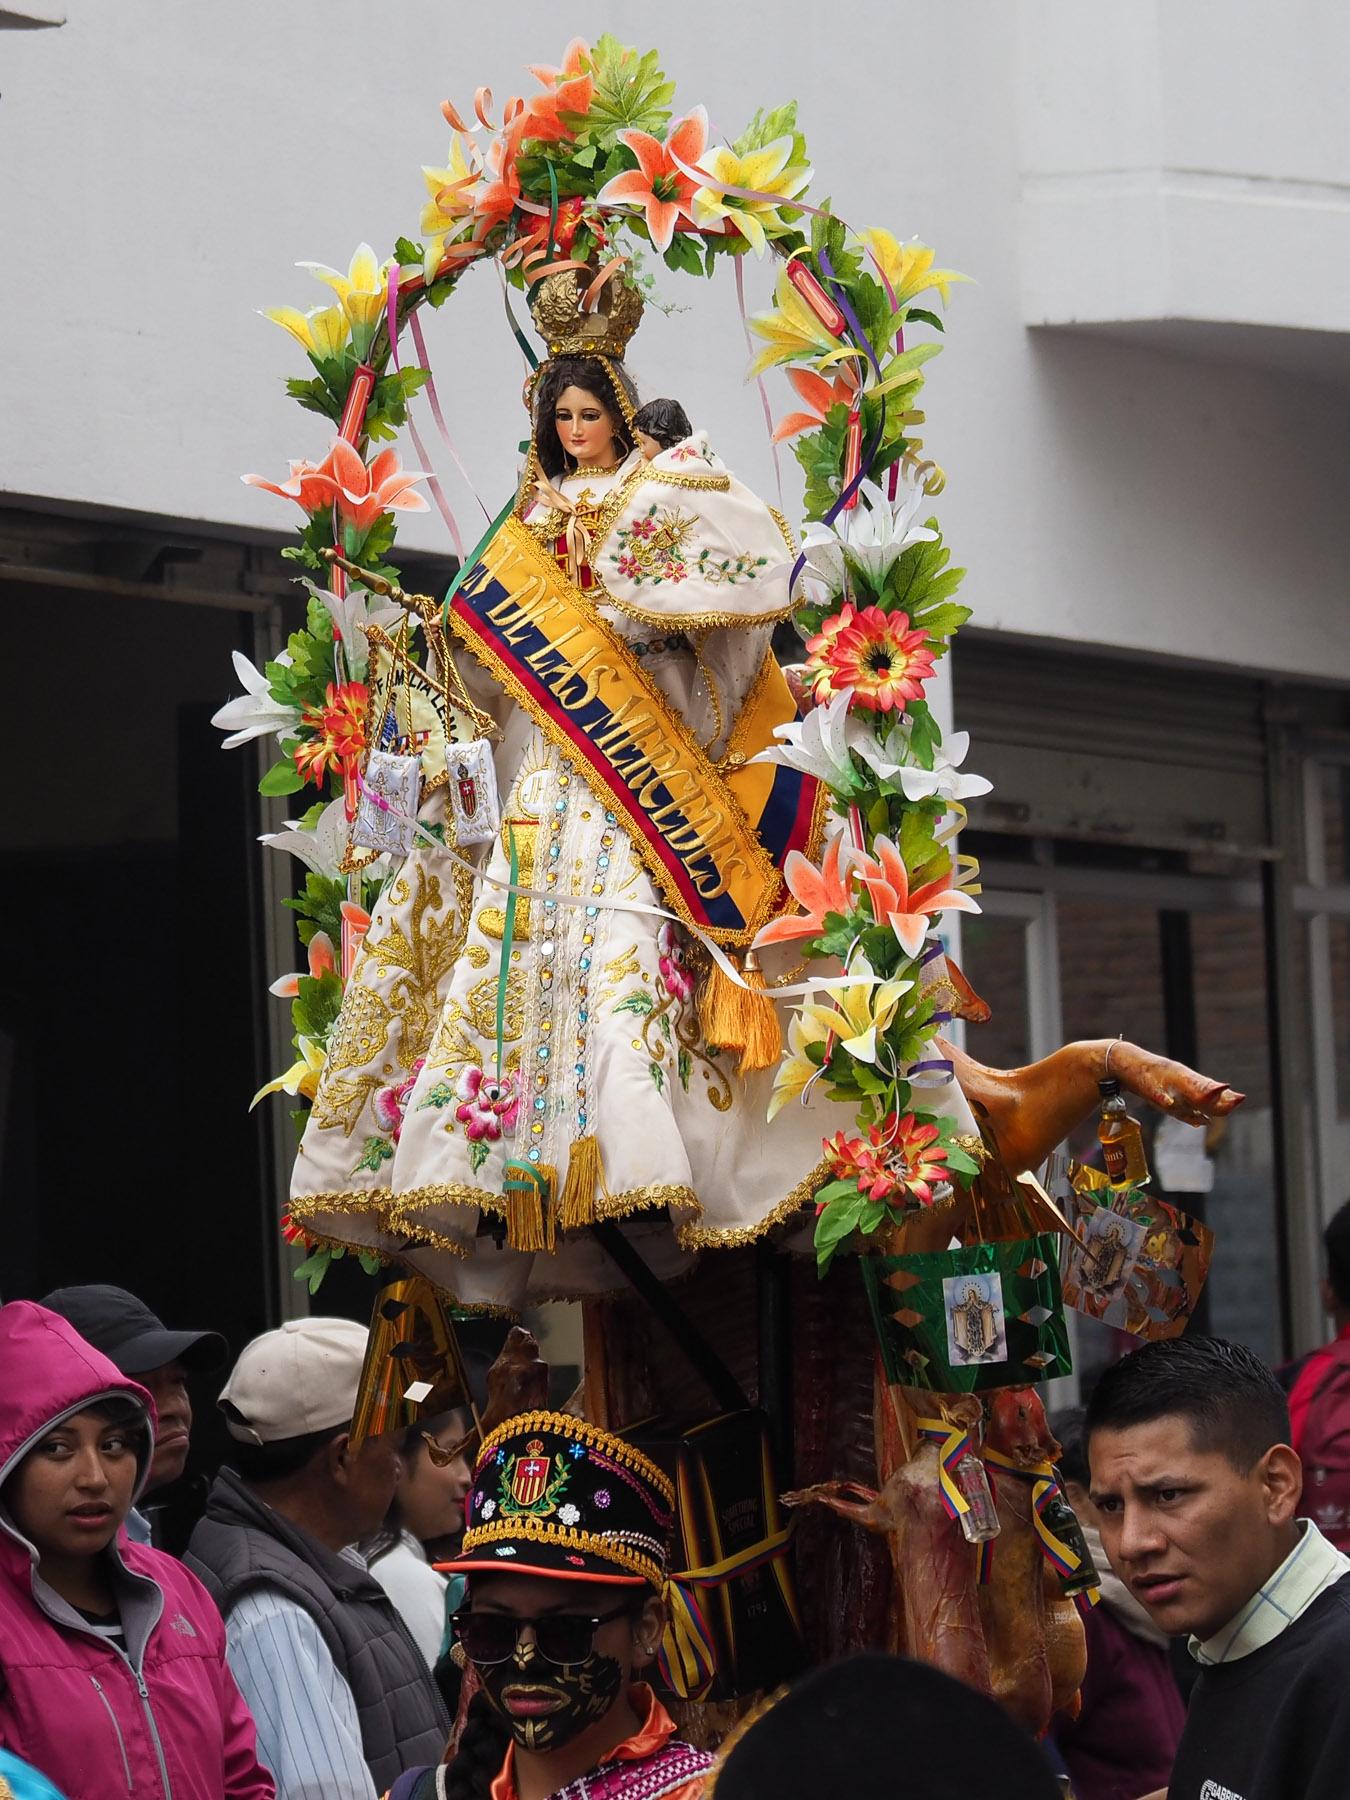 Das ganze Fest ist zu Ehren der Virgin de las Mercedes, beschützt Latatunga vor einem Vulkanausbruch des Cotopaxi